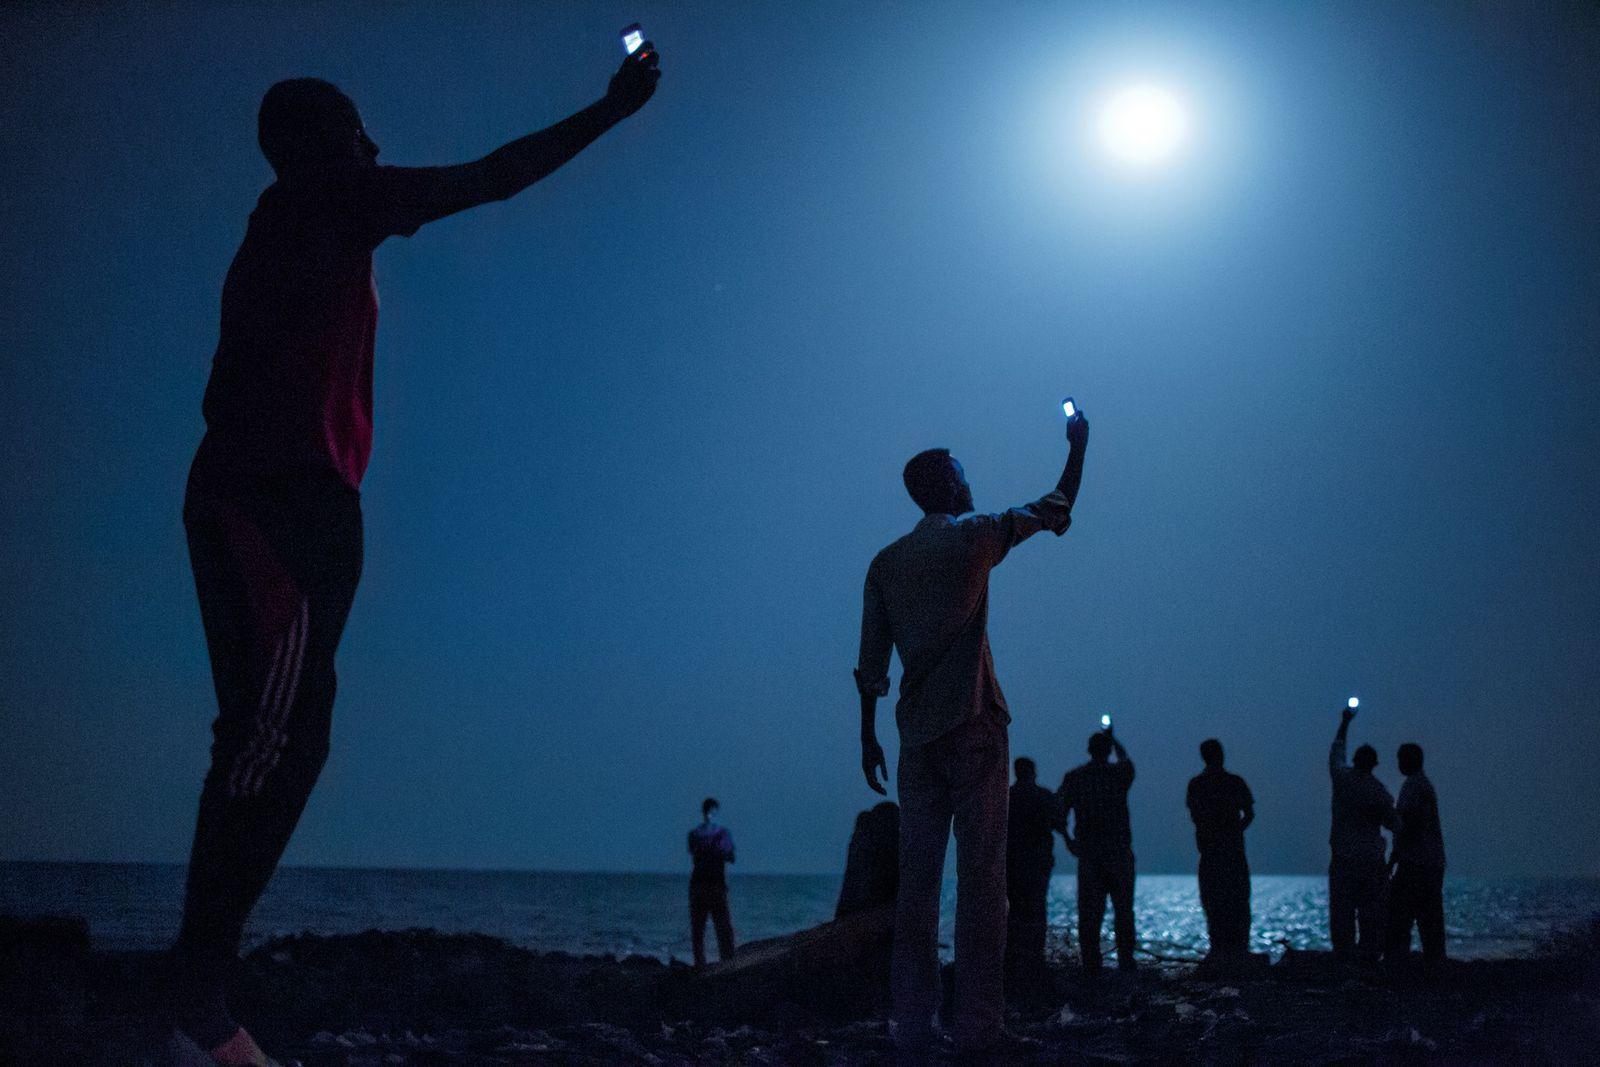 DJIBOUTI – No início de 2013, Paul Salopek, escritor da National Geographic, deu literalmente os primeiros ...